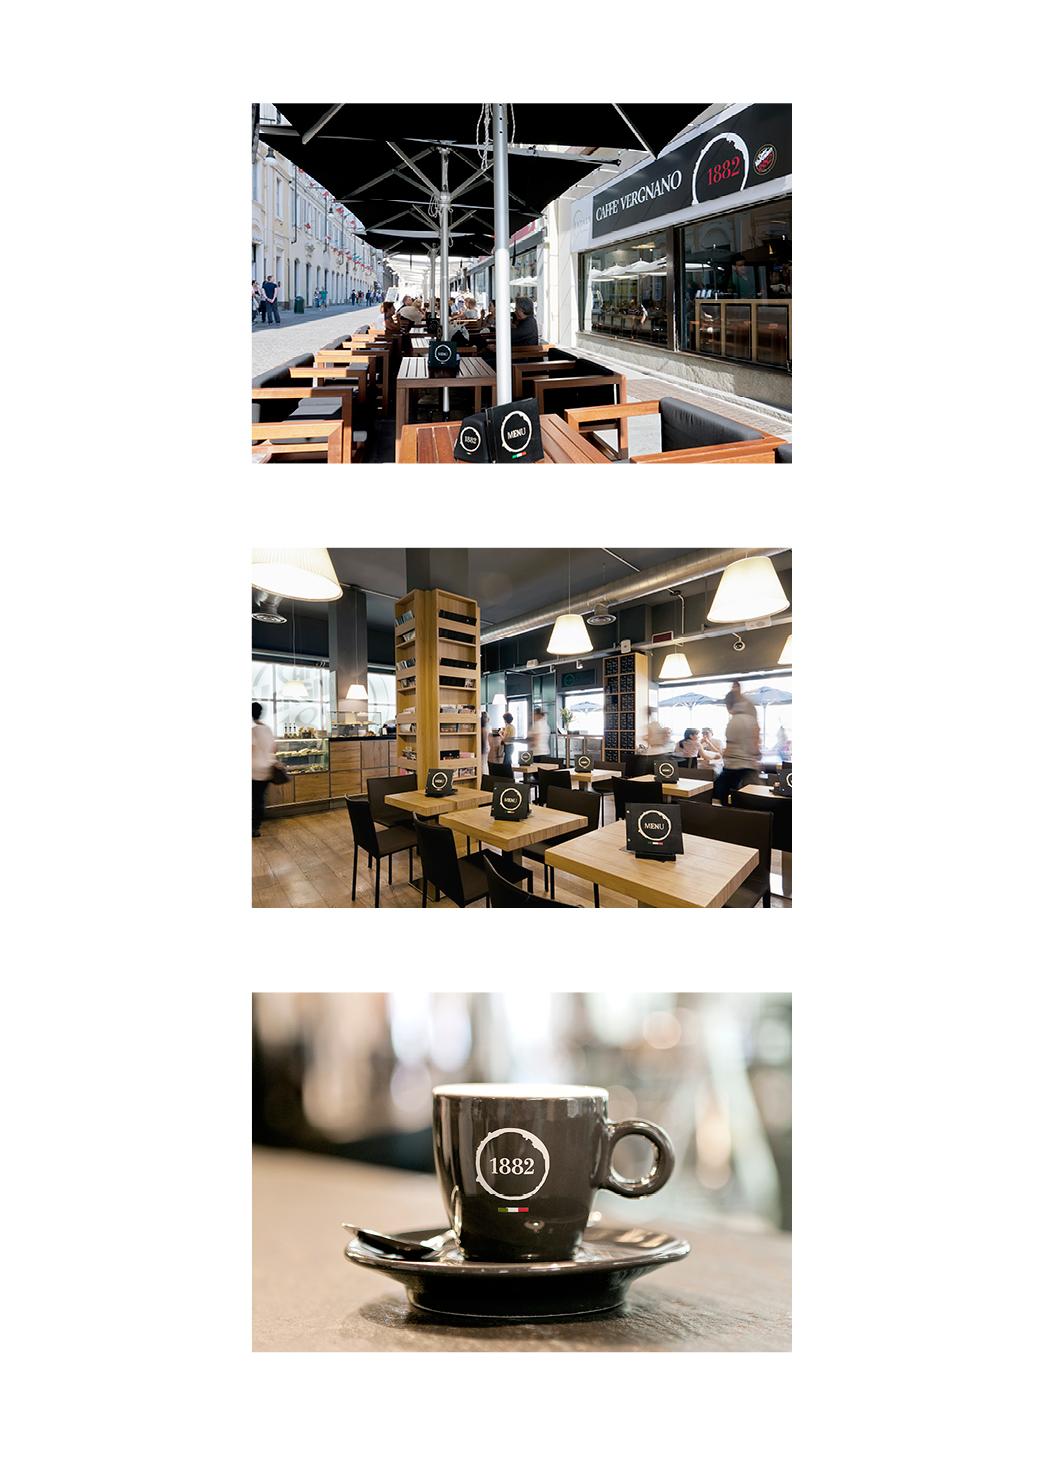 portfolio-giulia-bison-2015-1177-caffè-vergnano2